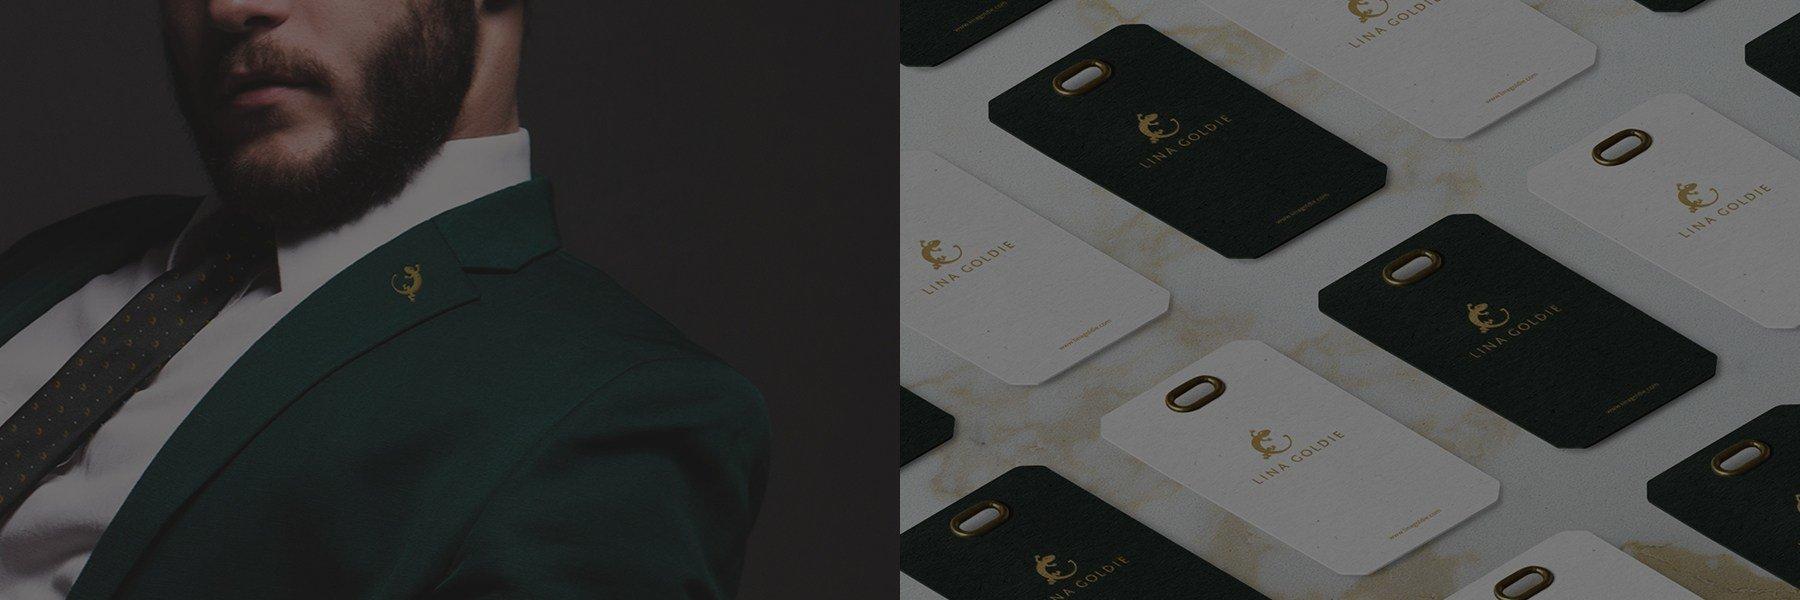 Web designing and development, Logo designing, Web Design Company Dubai, website designing Dubai